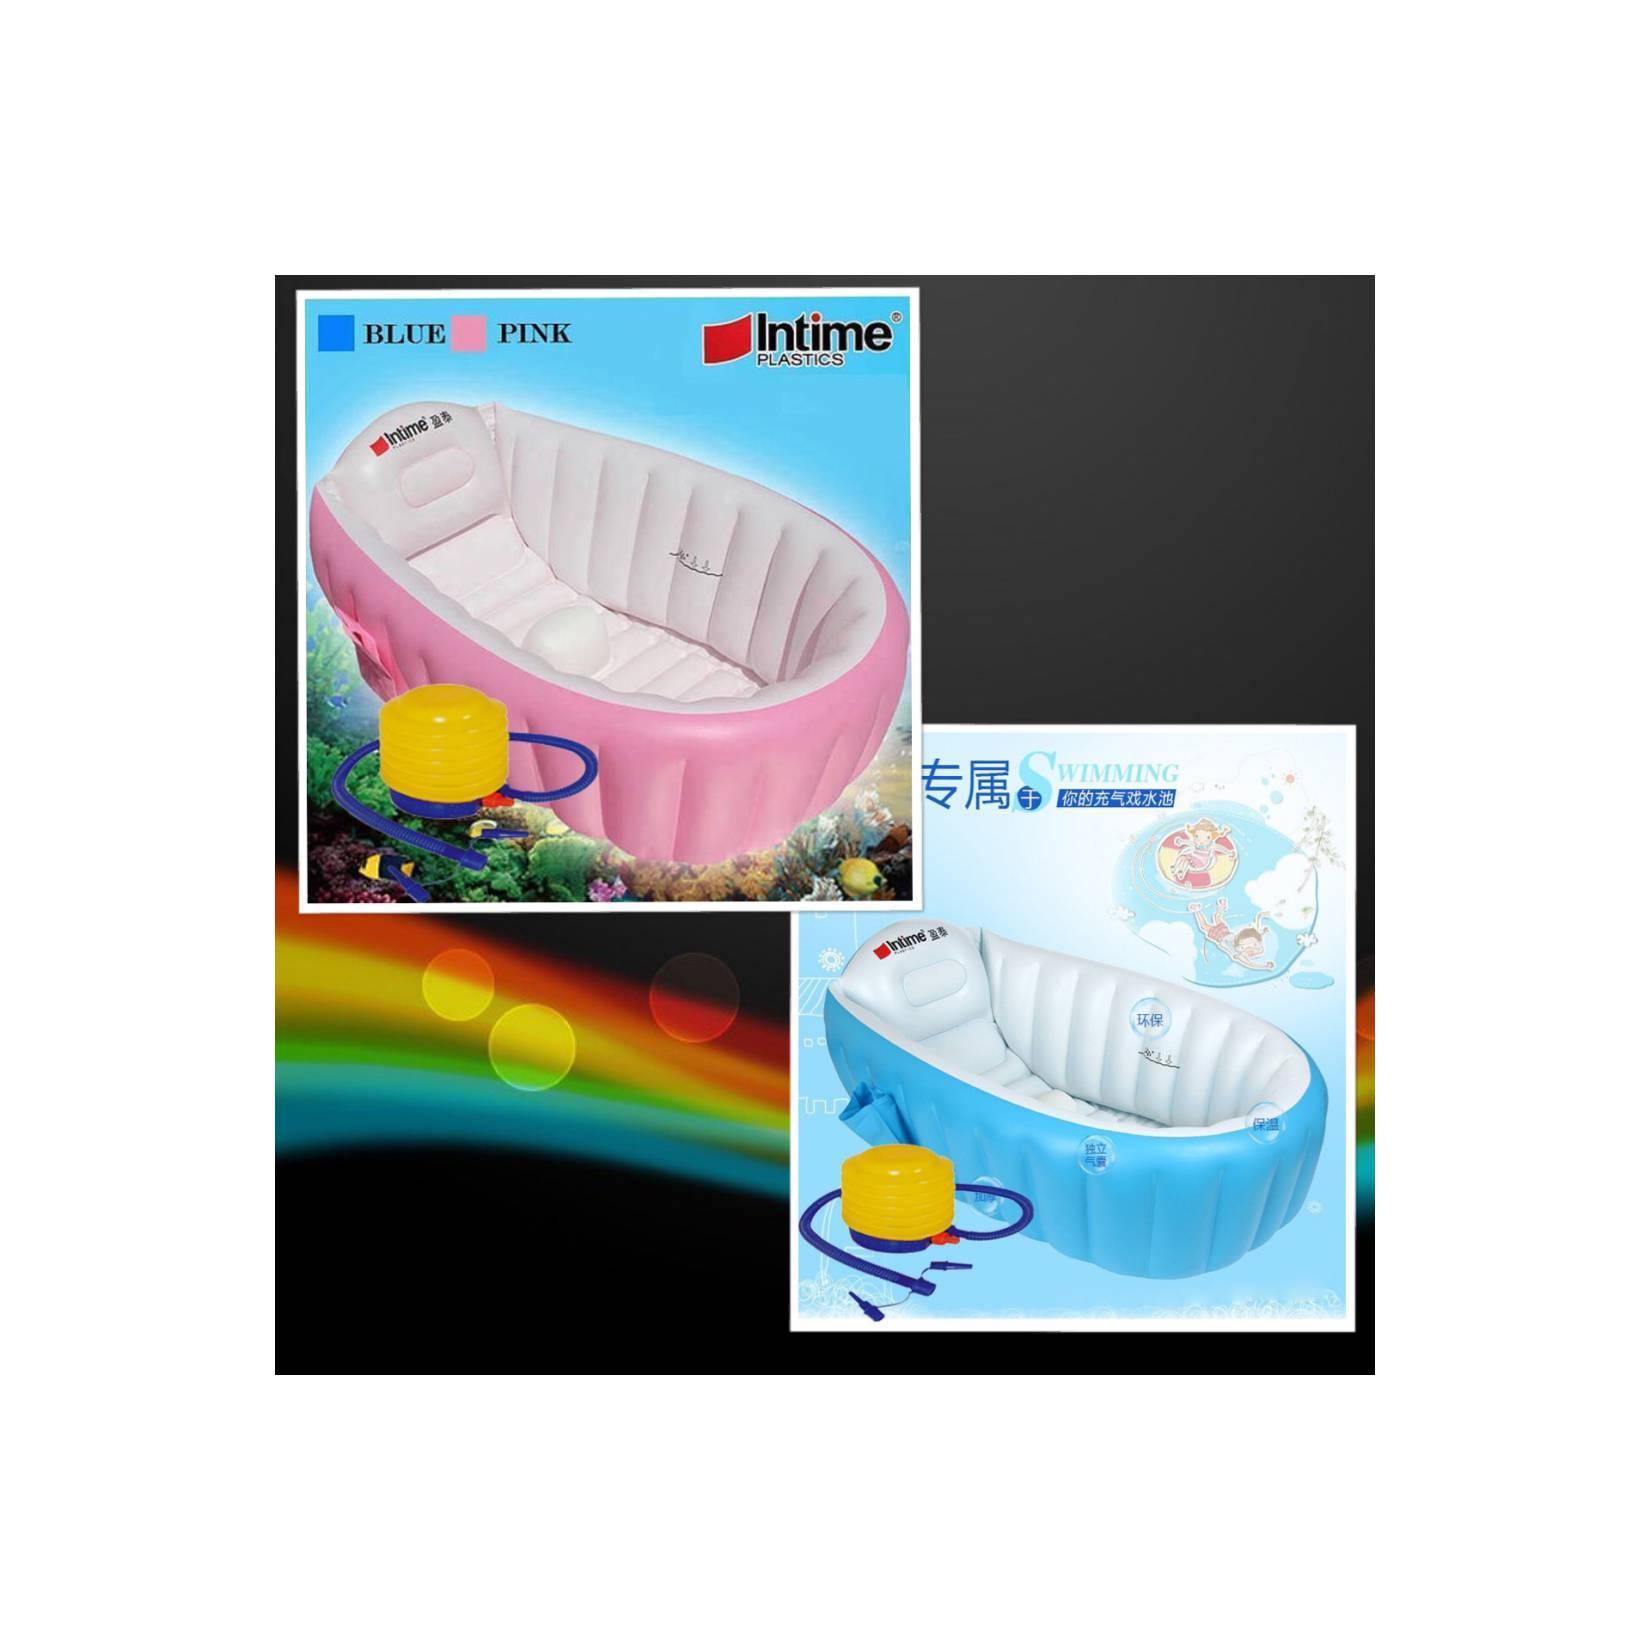 Buy Sell Cheapest Intime Tempat Mandi Best Quality Product Deals Baby Bath Tub Bak Bayi Kolam Pompa Angin